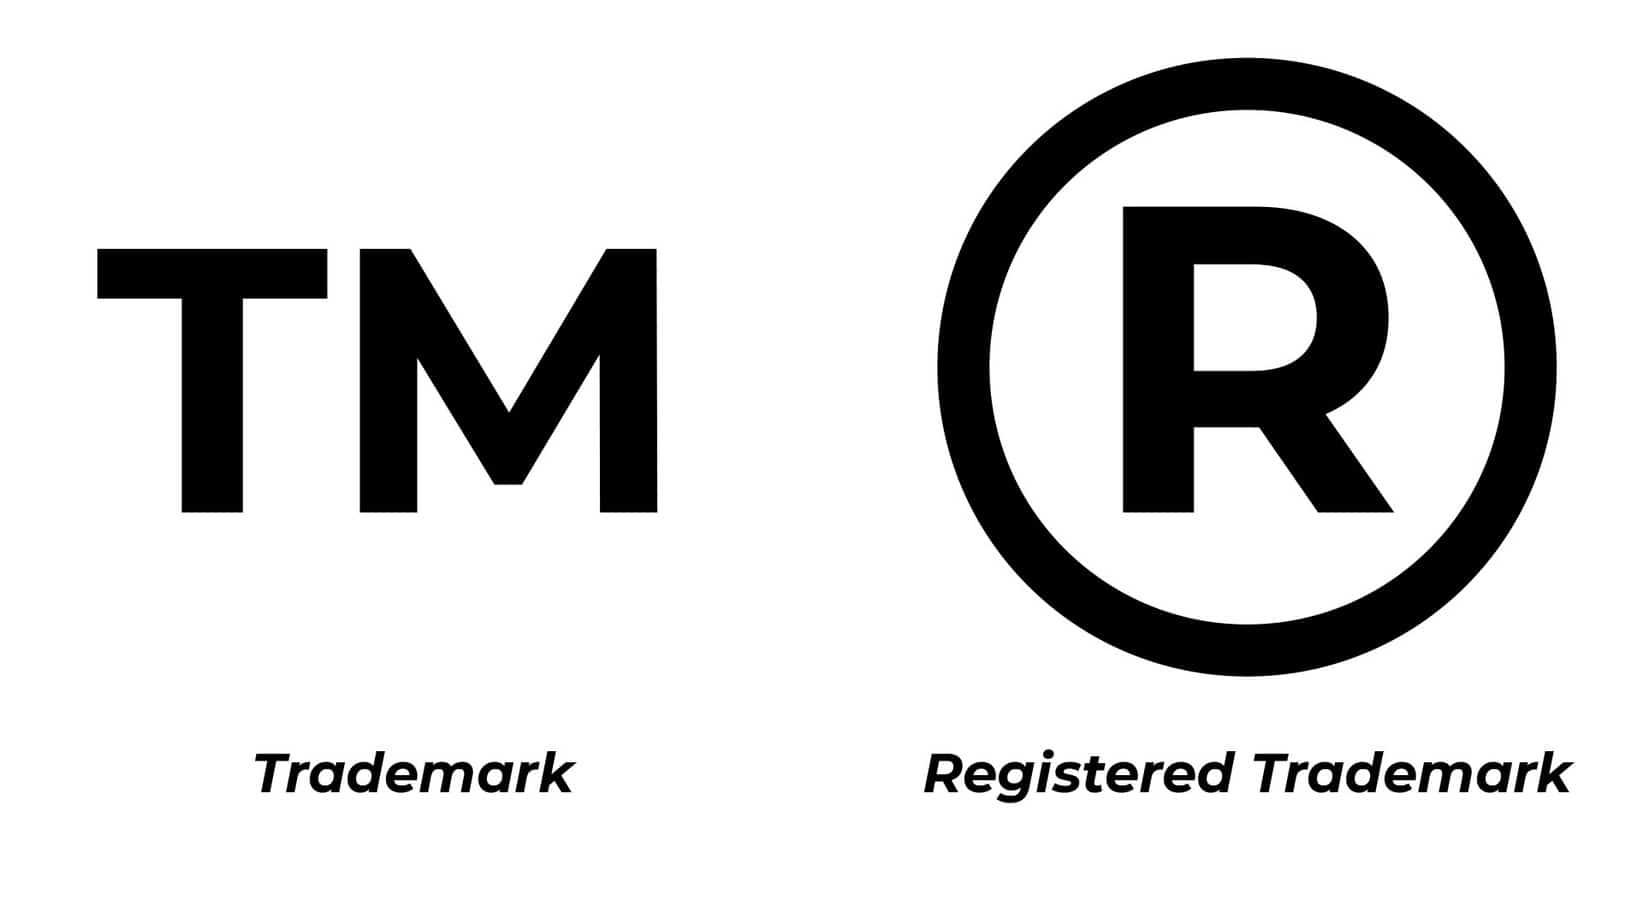 Should You Have a Registered Trademark